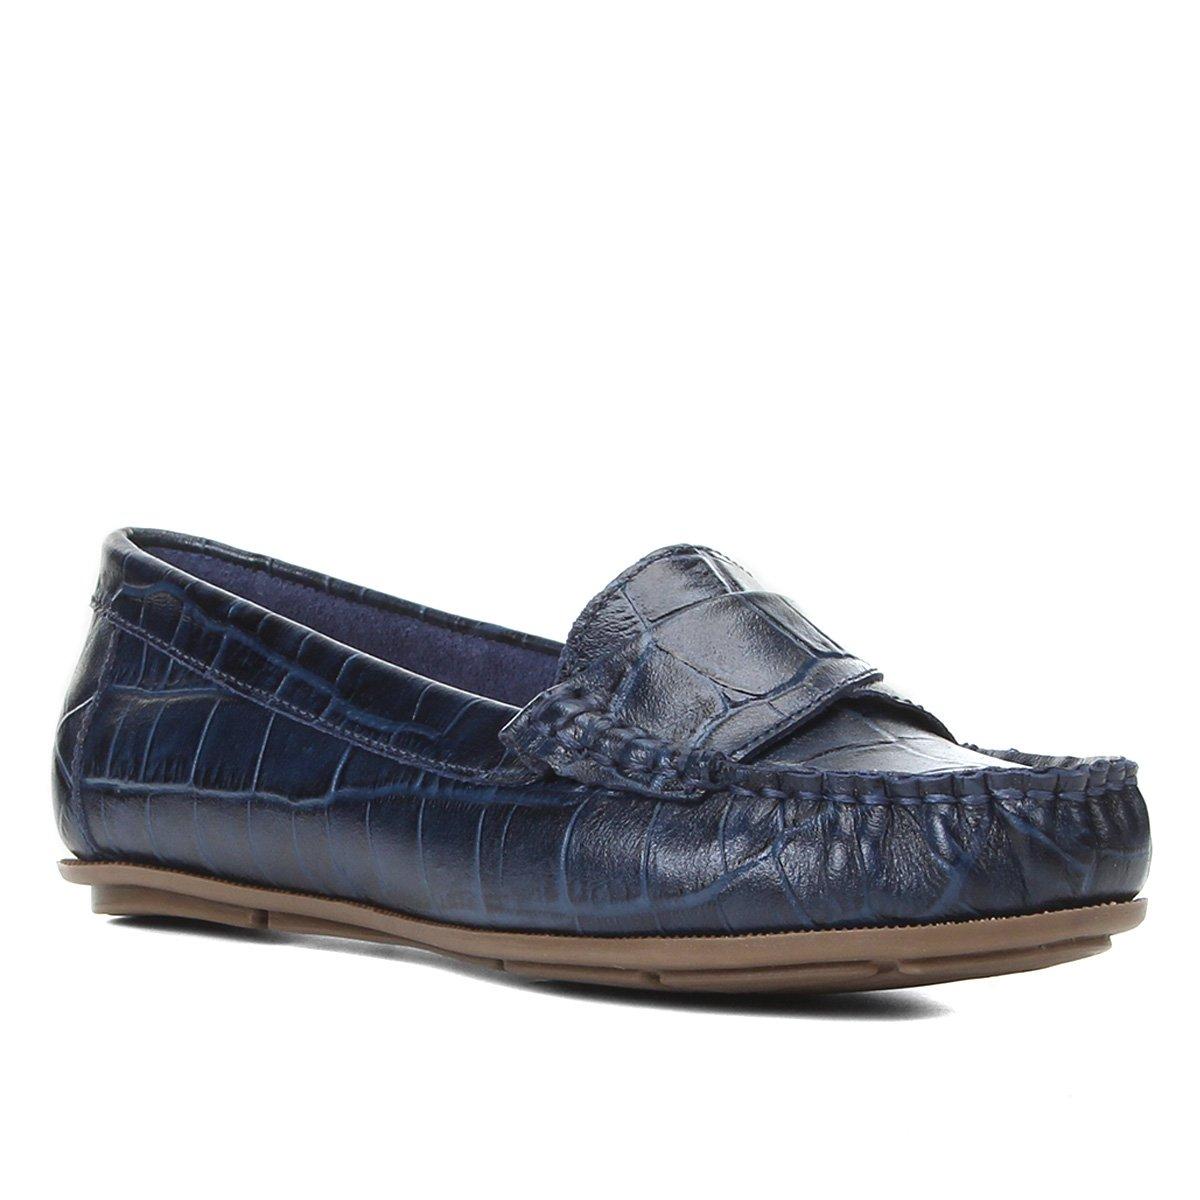 Mocassim Couro Shoestock Croco Gravata Torcida Feminino